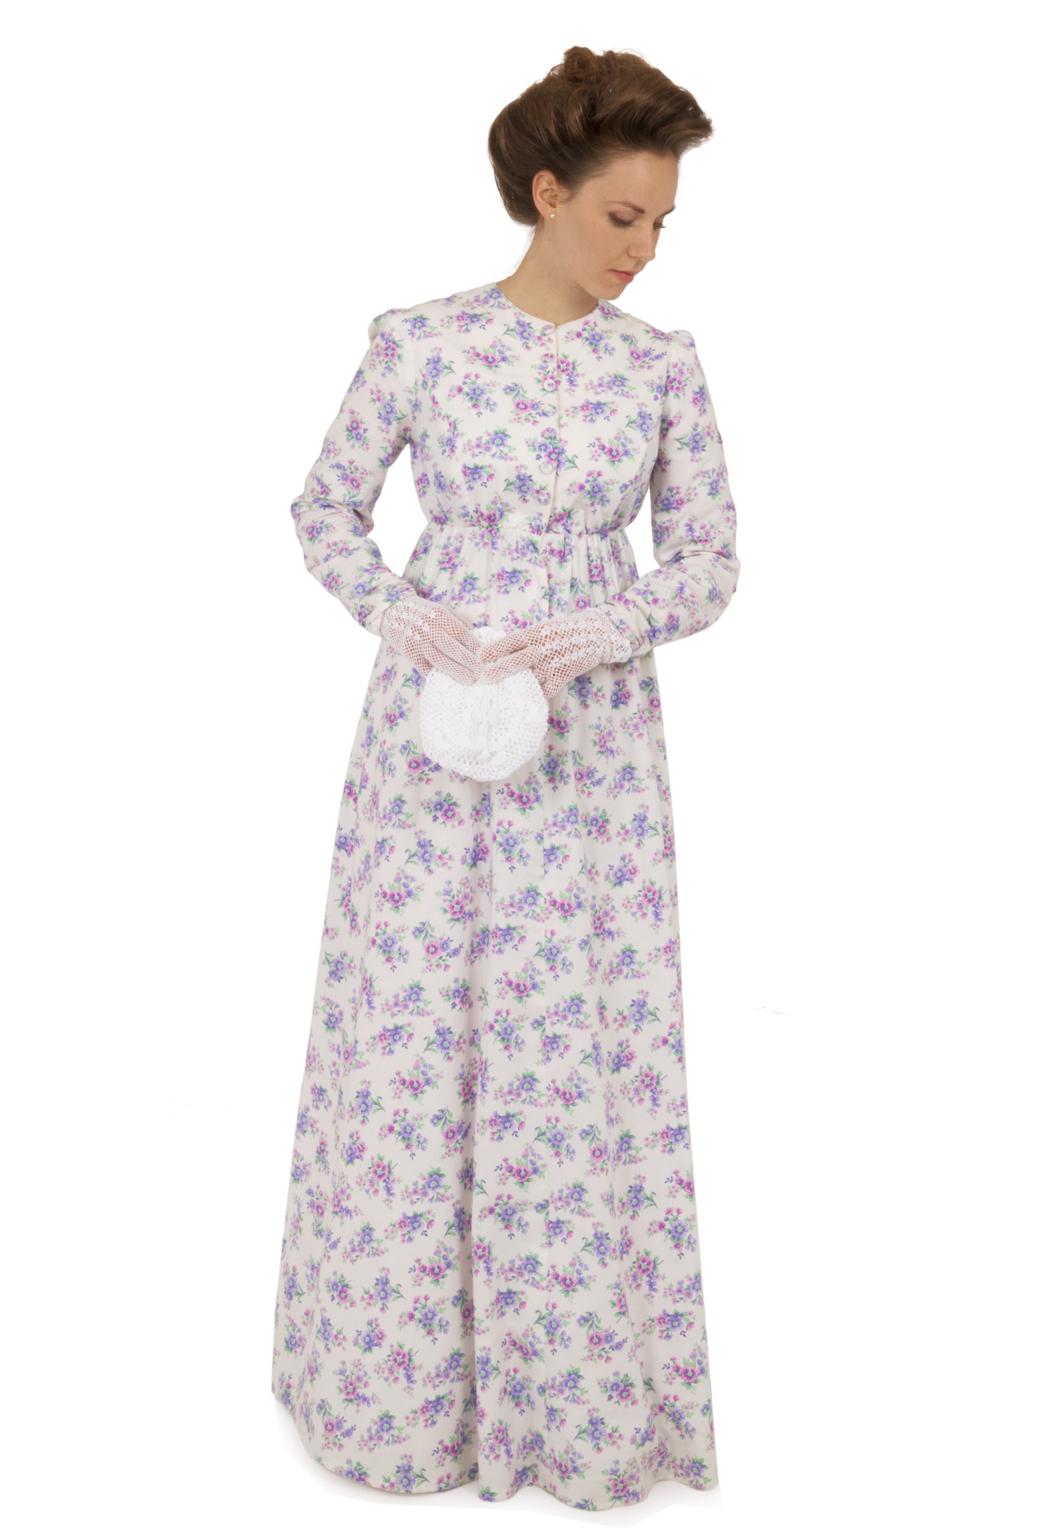 Wisteria Regency Era Dress | Recollections